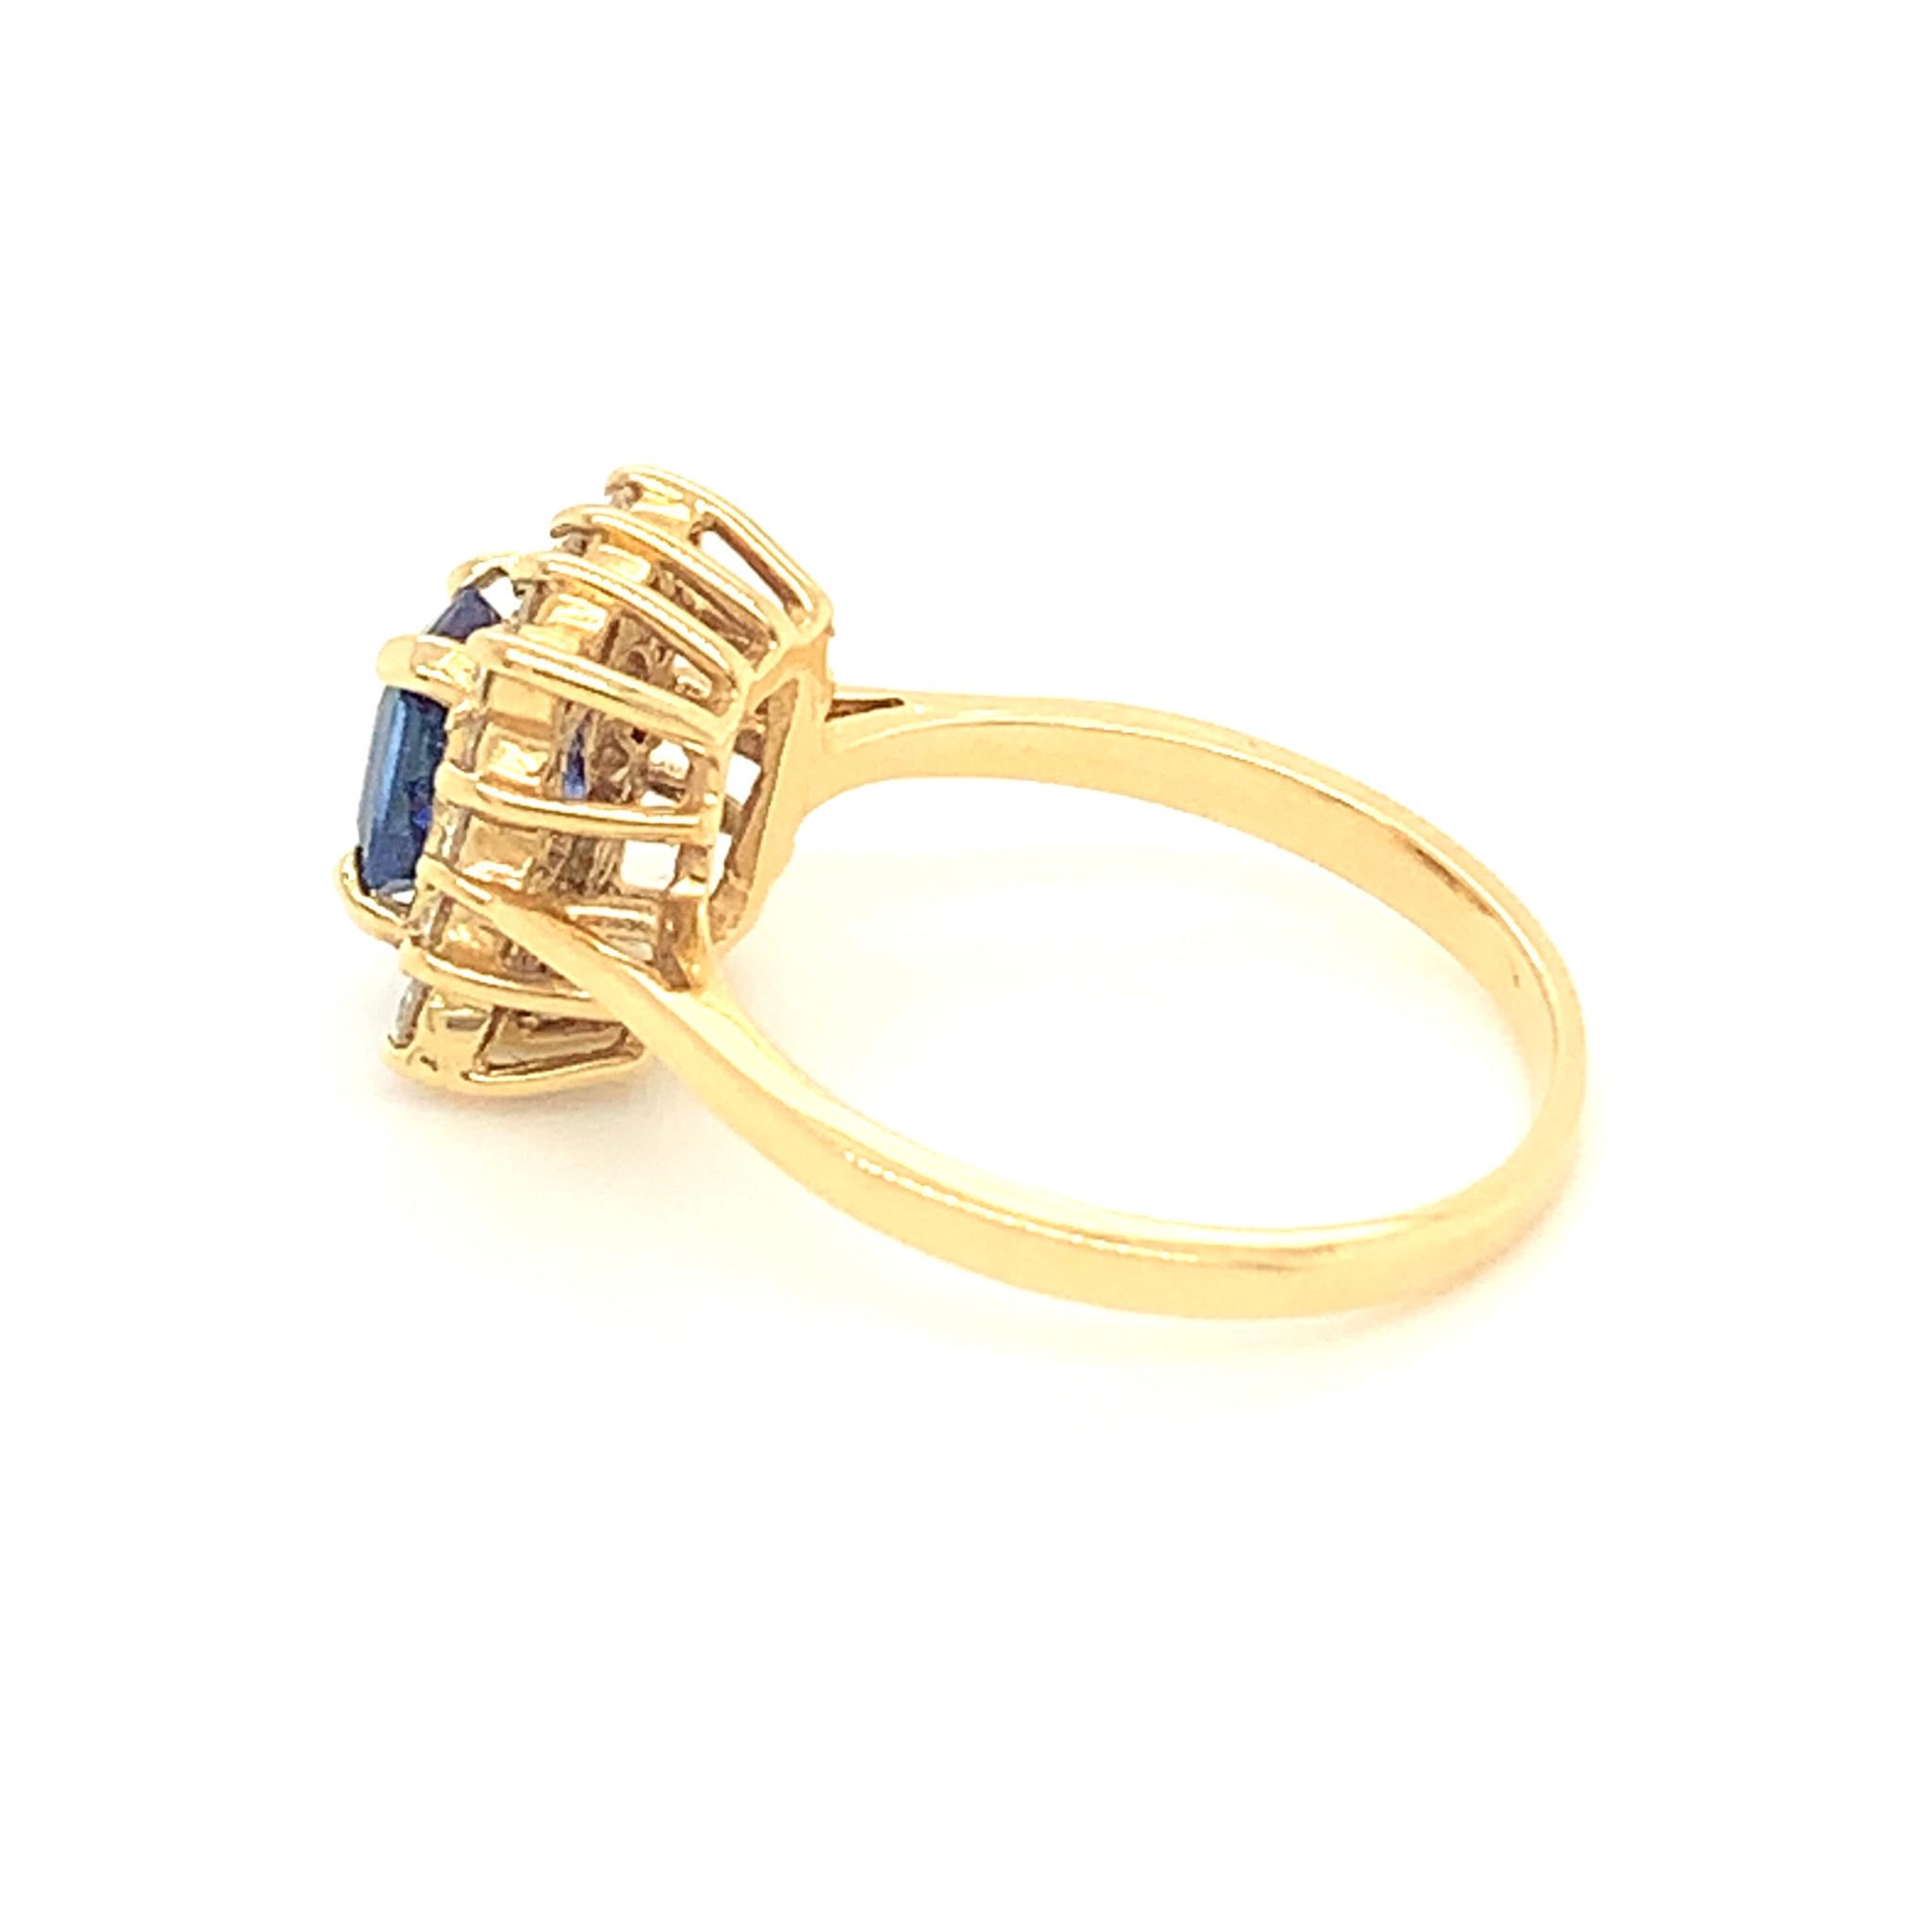 Freedman 14kt Yellow Gold Emerald Cut Sapphire & Diamond Halo Ring